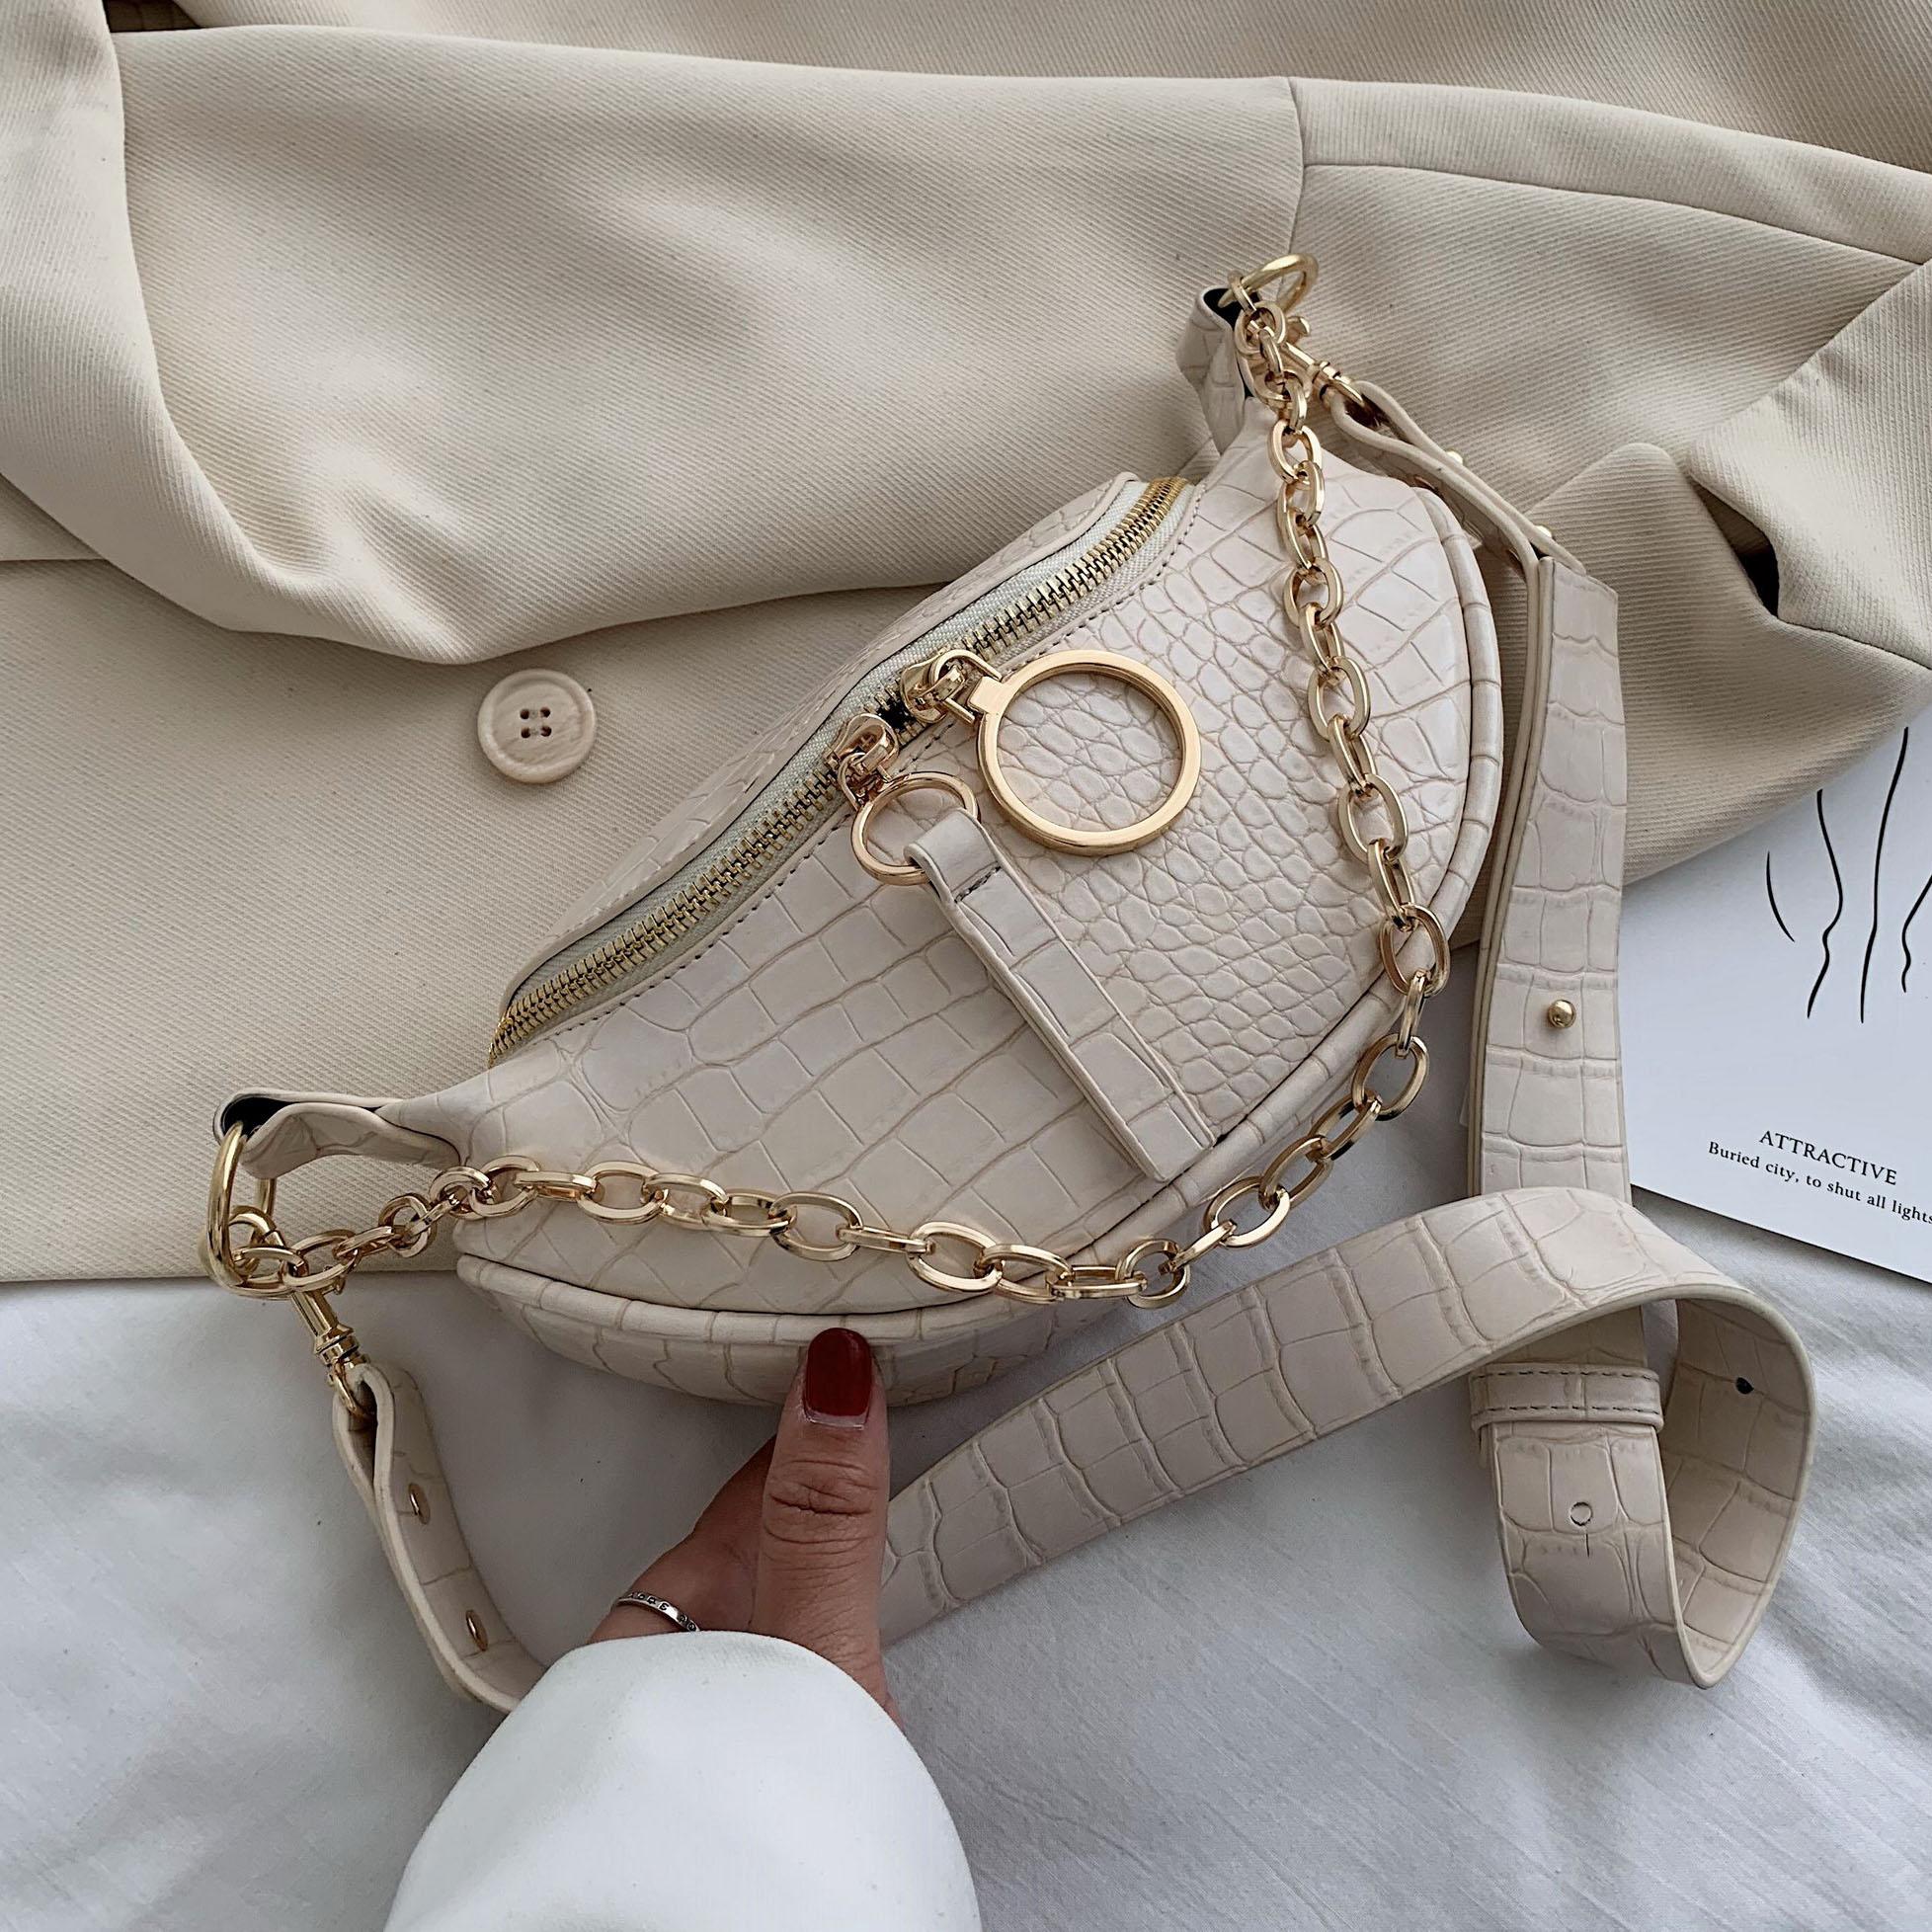 SWDF Simple Fashion Small PU Leather Crossbody Bags For Women 2021 Chain Shoulder Handbags Female Travel Cross Body Bag